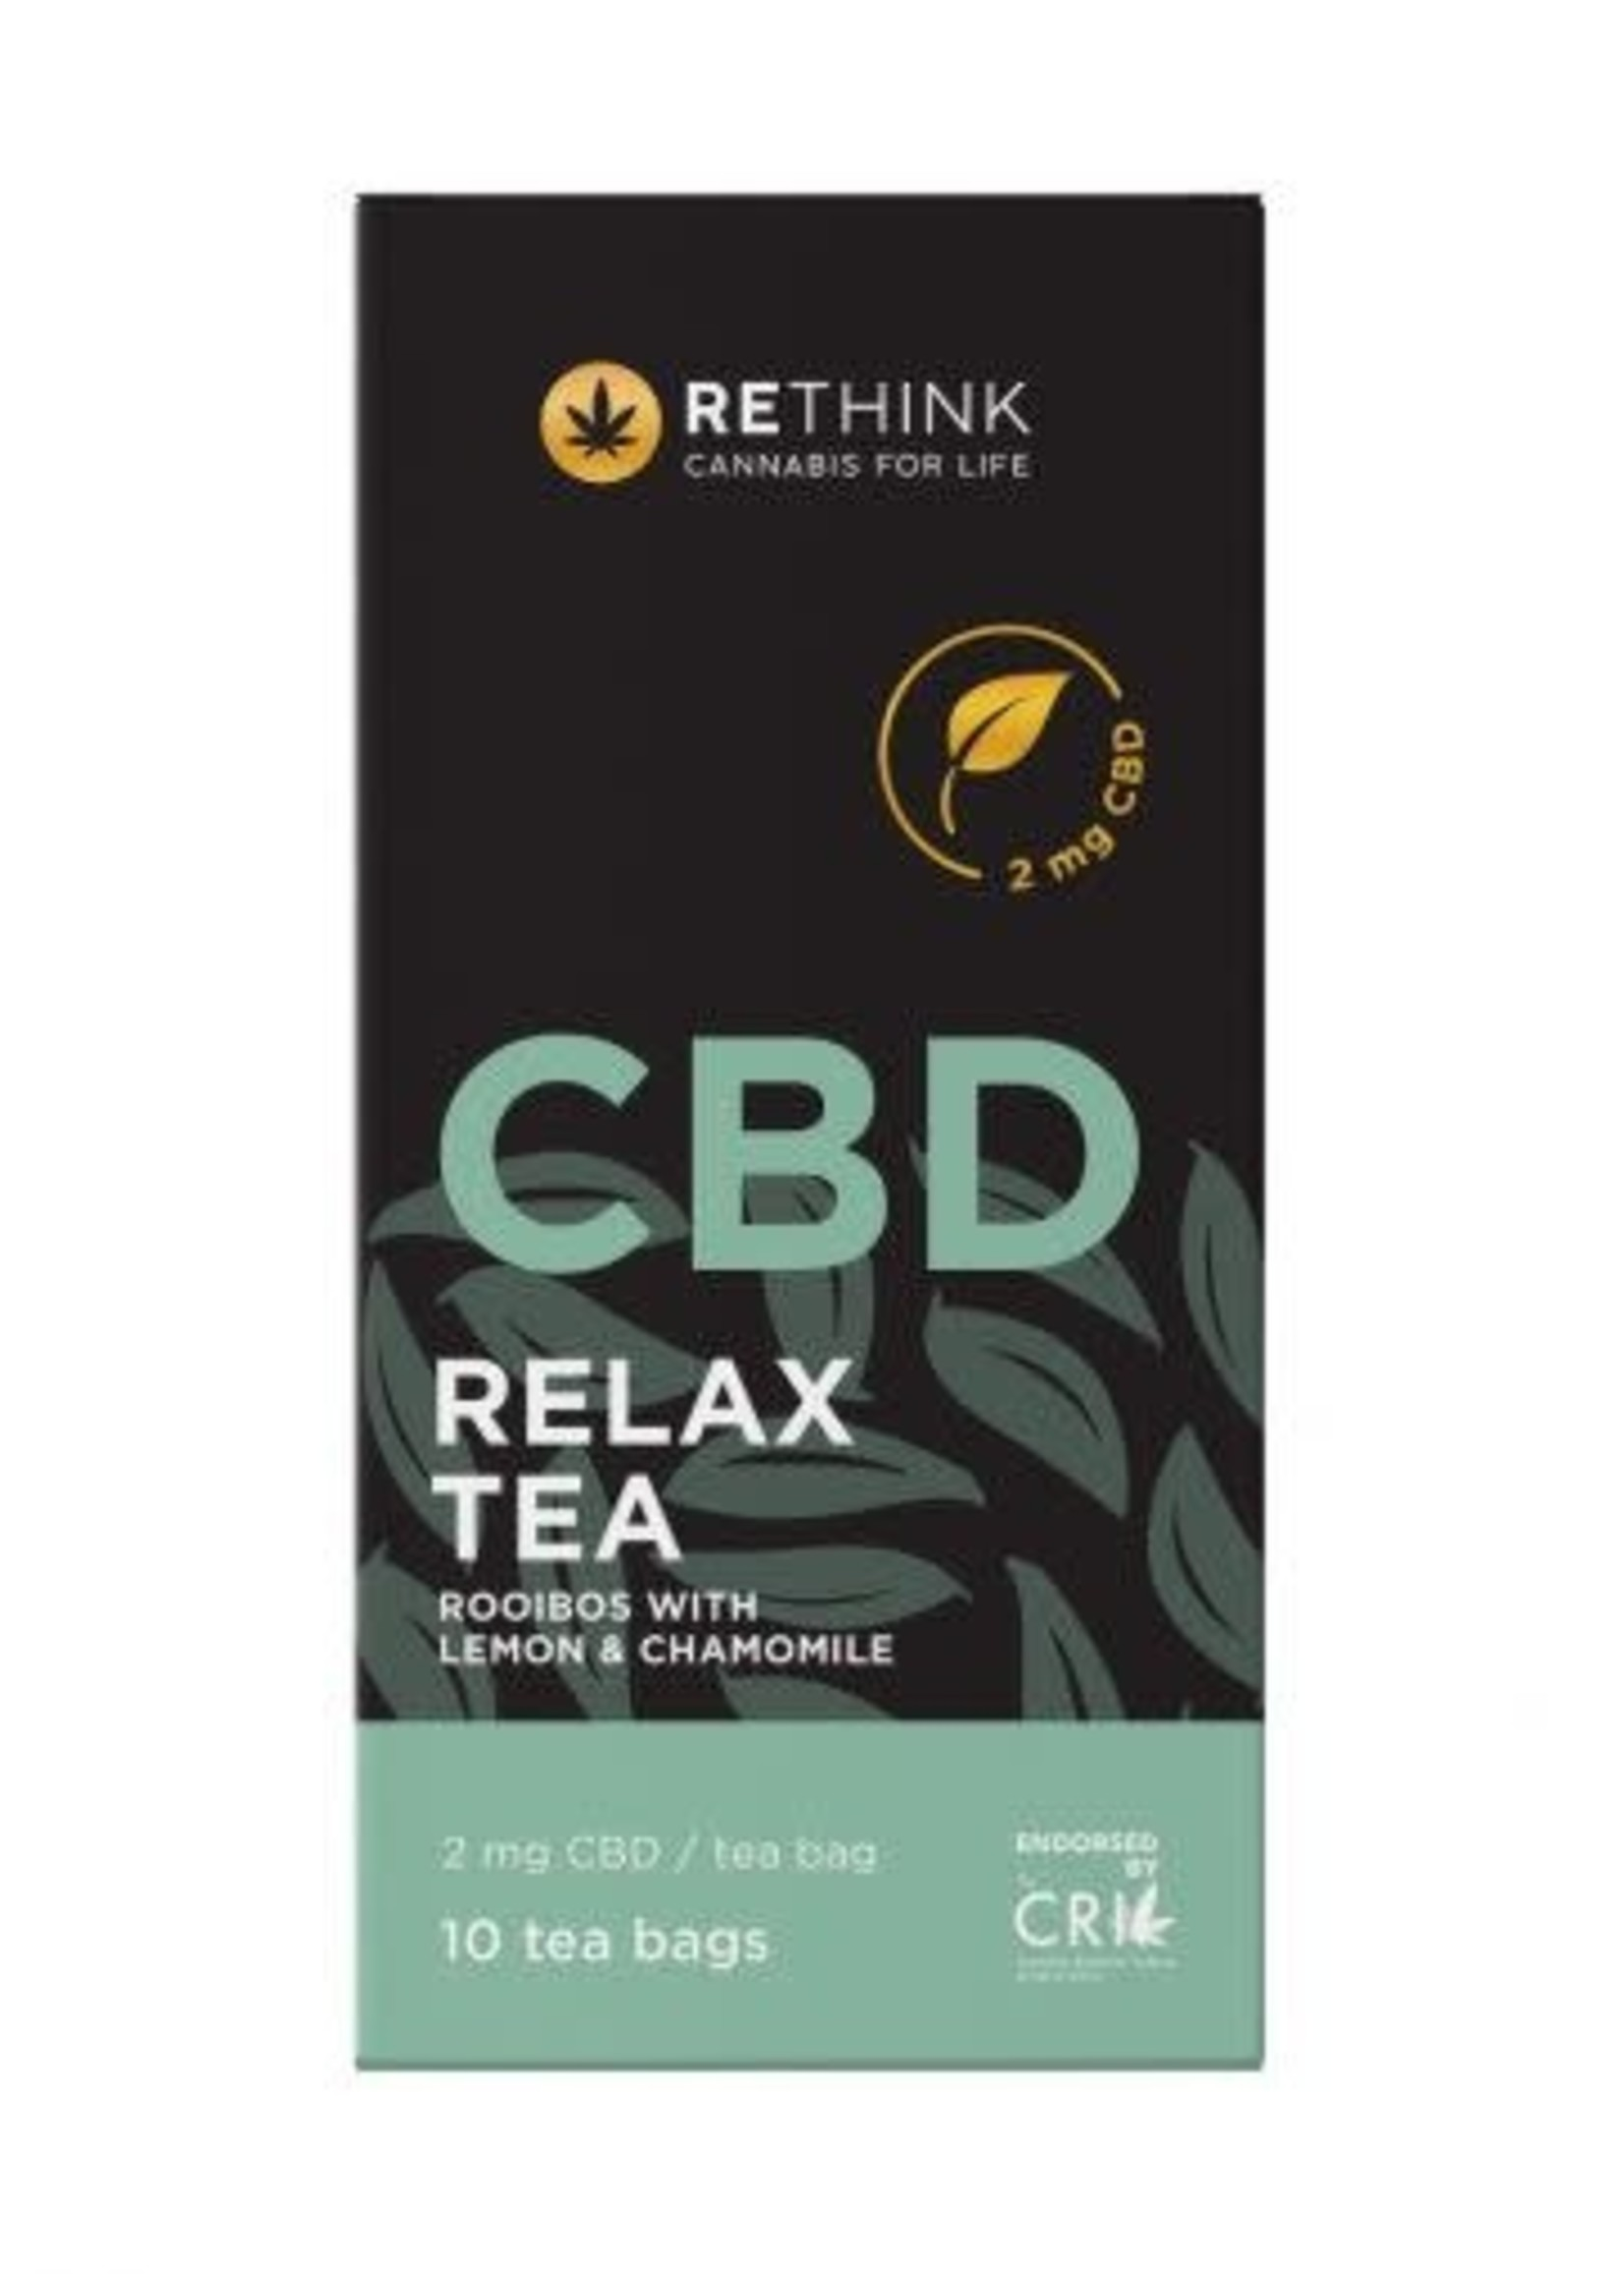 Rethink CBD Relax tea